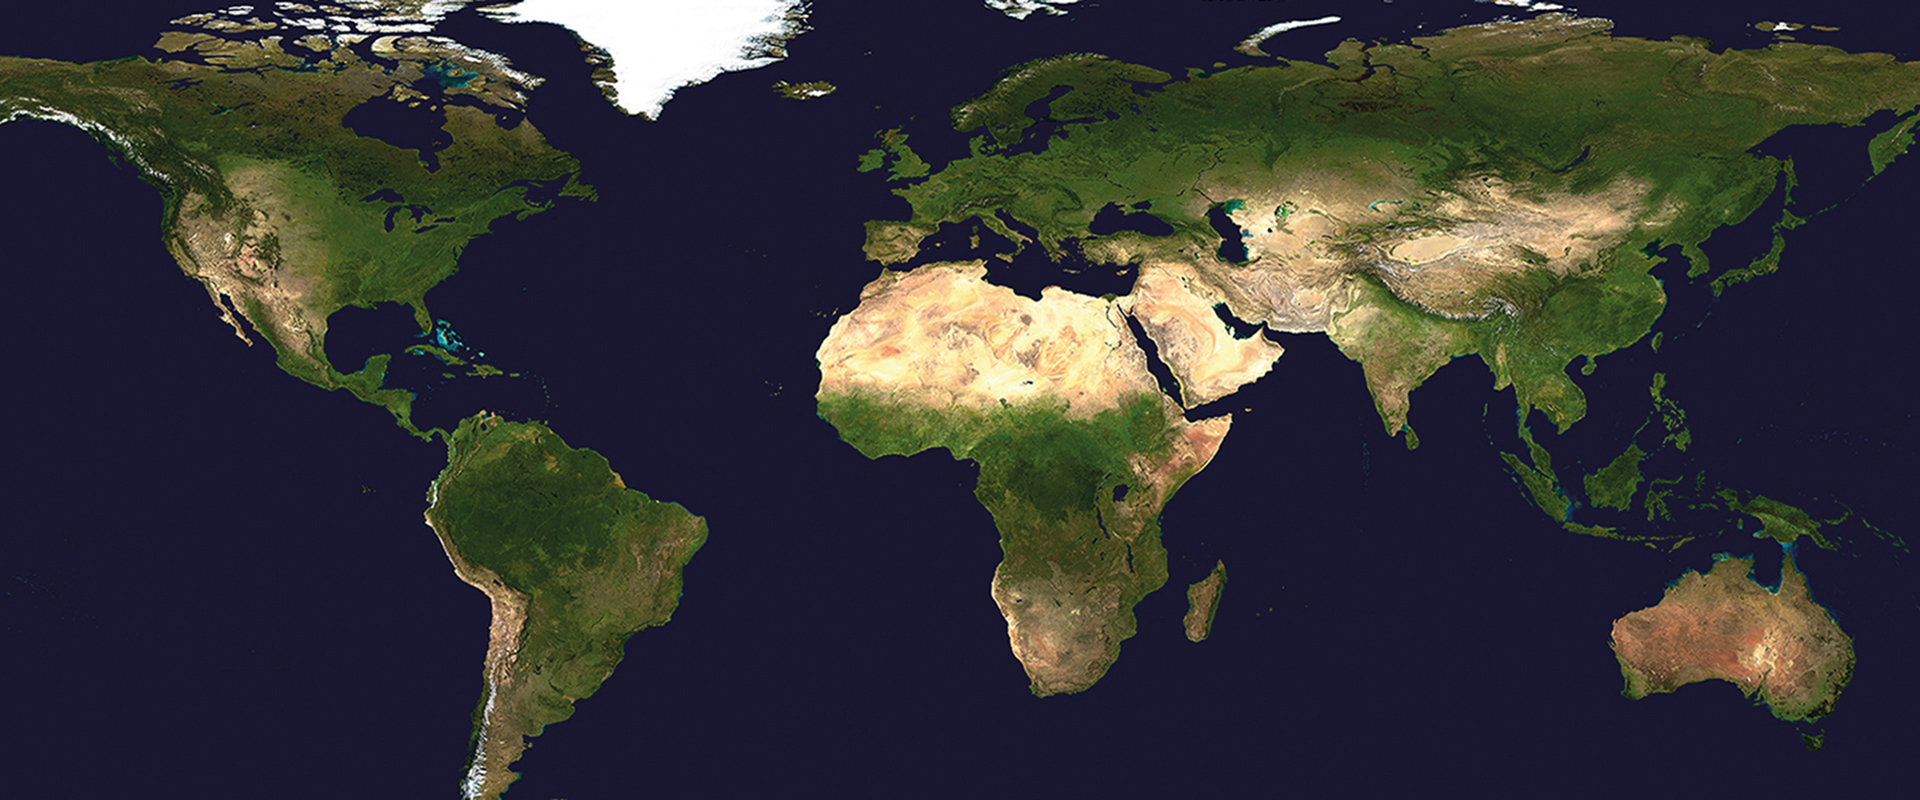 Whole_world_offerta_integrata